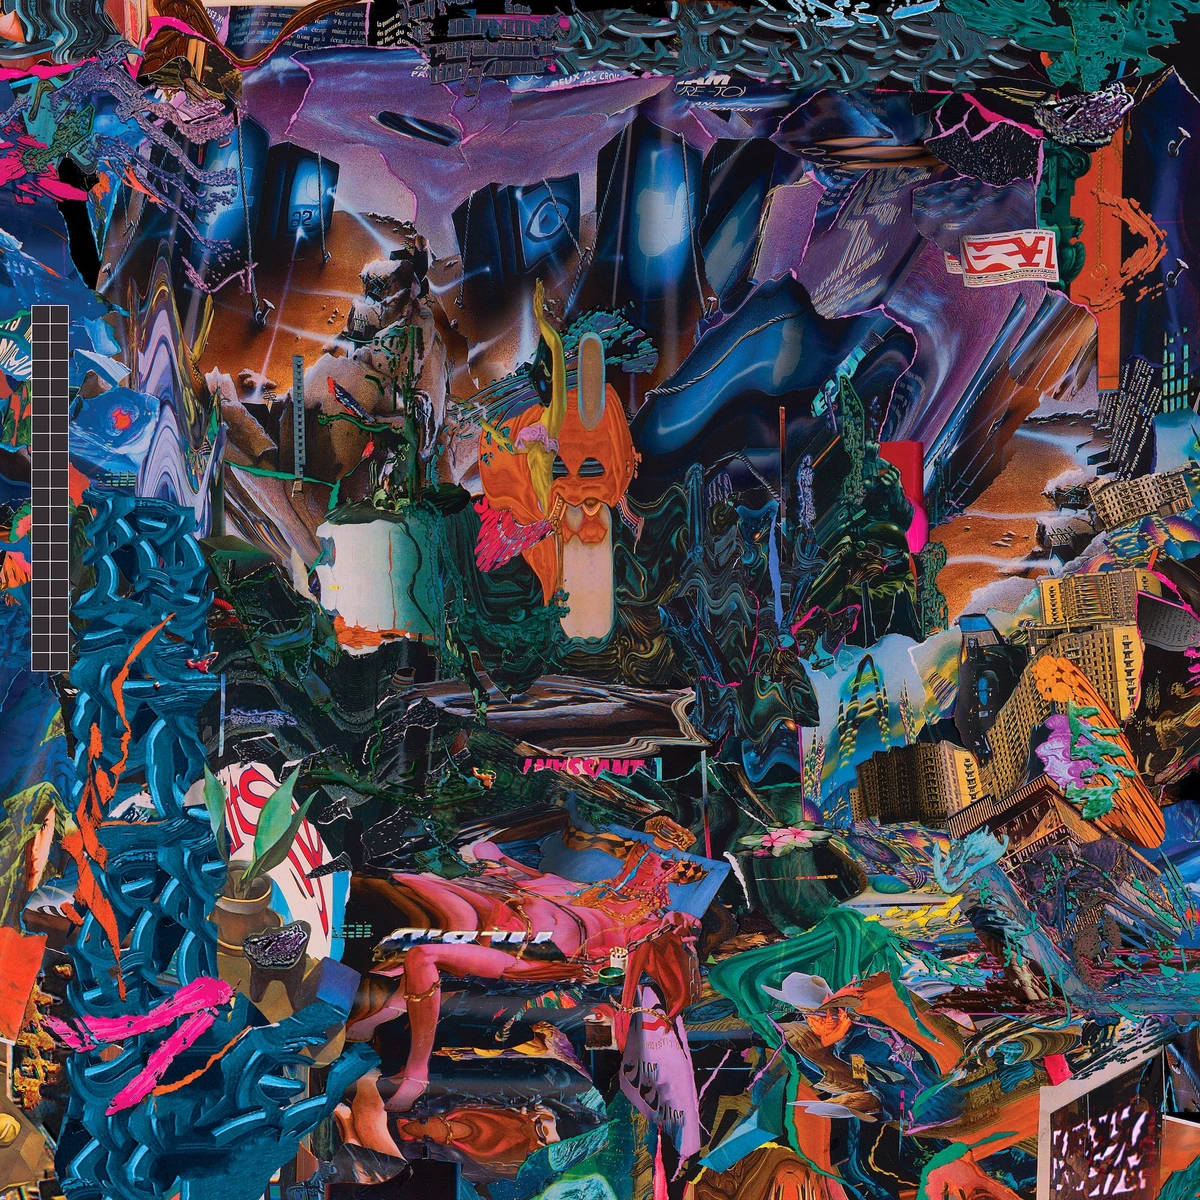 black midi cavalcade лучший альбом 2021